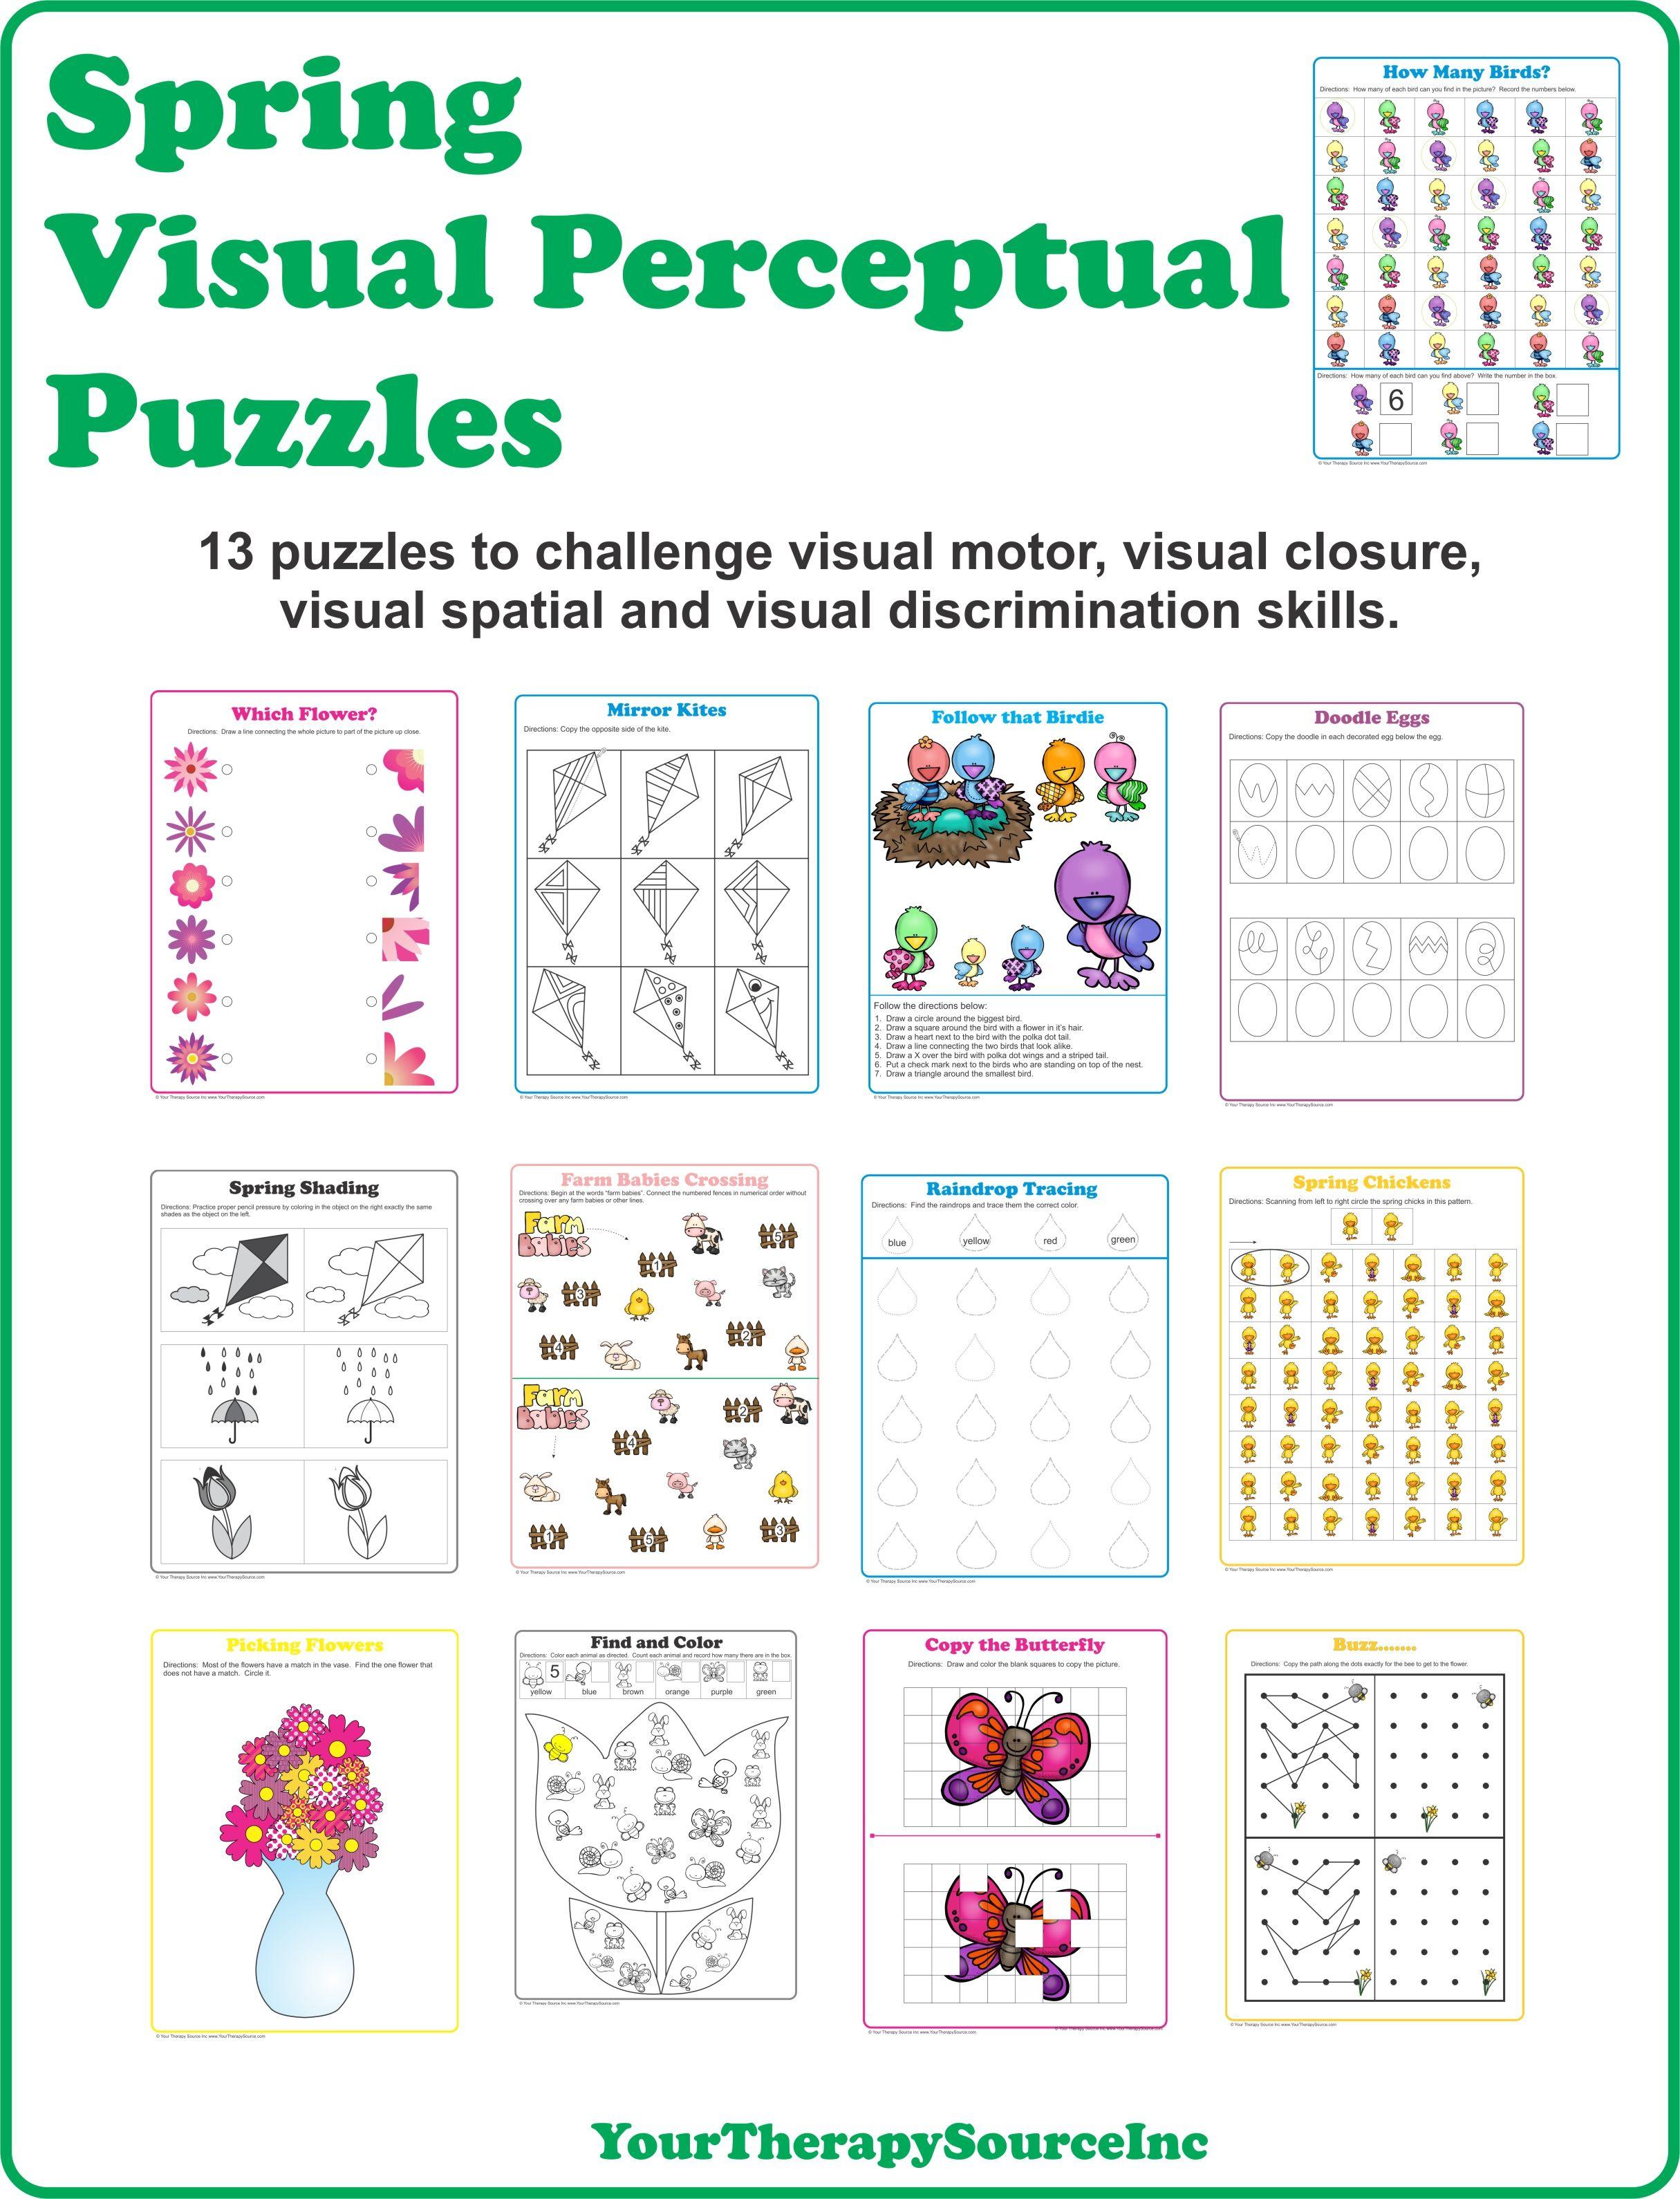 Printable Spring Puzzles Printable Crossword Puzzles Kids Worksheets Printables Visual Discrimination English Worksheets For Kids [ 3180 x 2430 Pixel ]